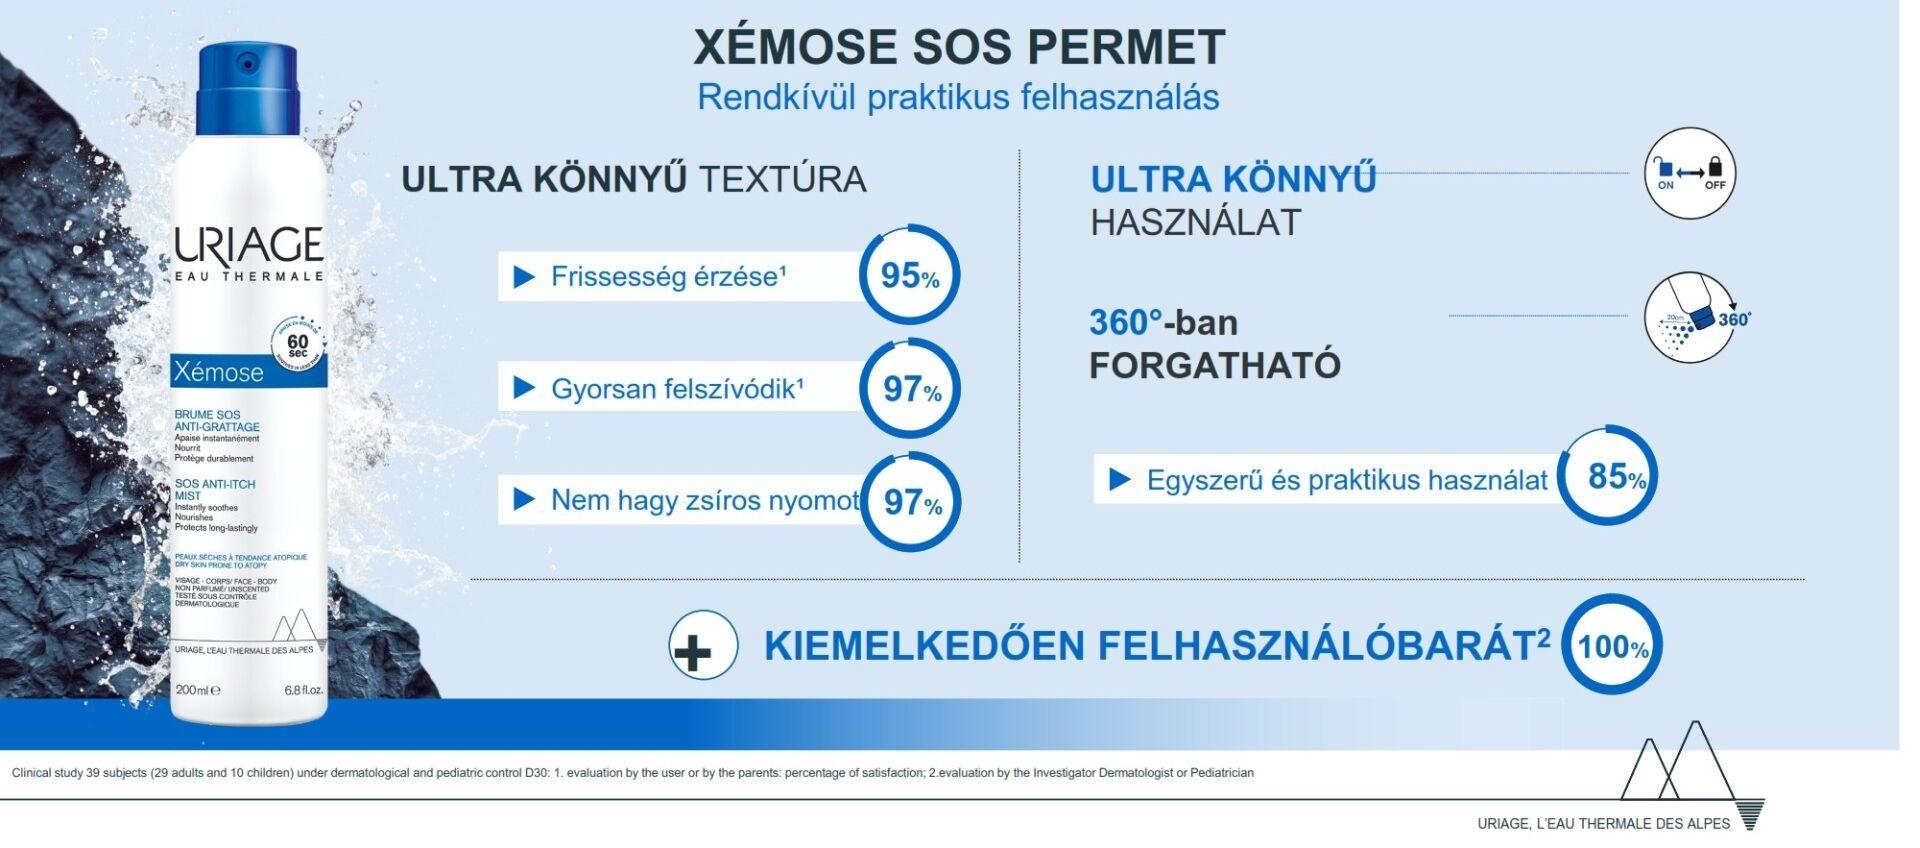 Uriage XÉMOSE SOS permet száraz bőrre 200ml